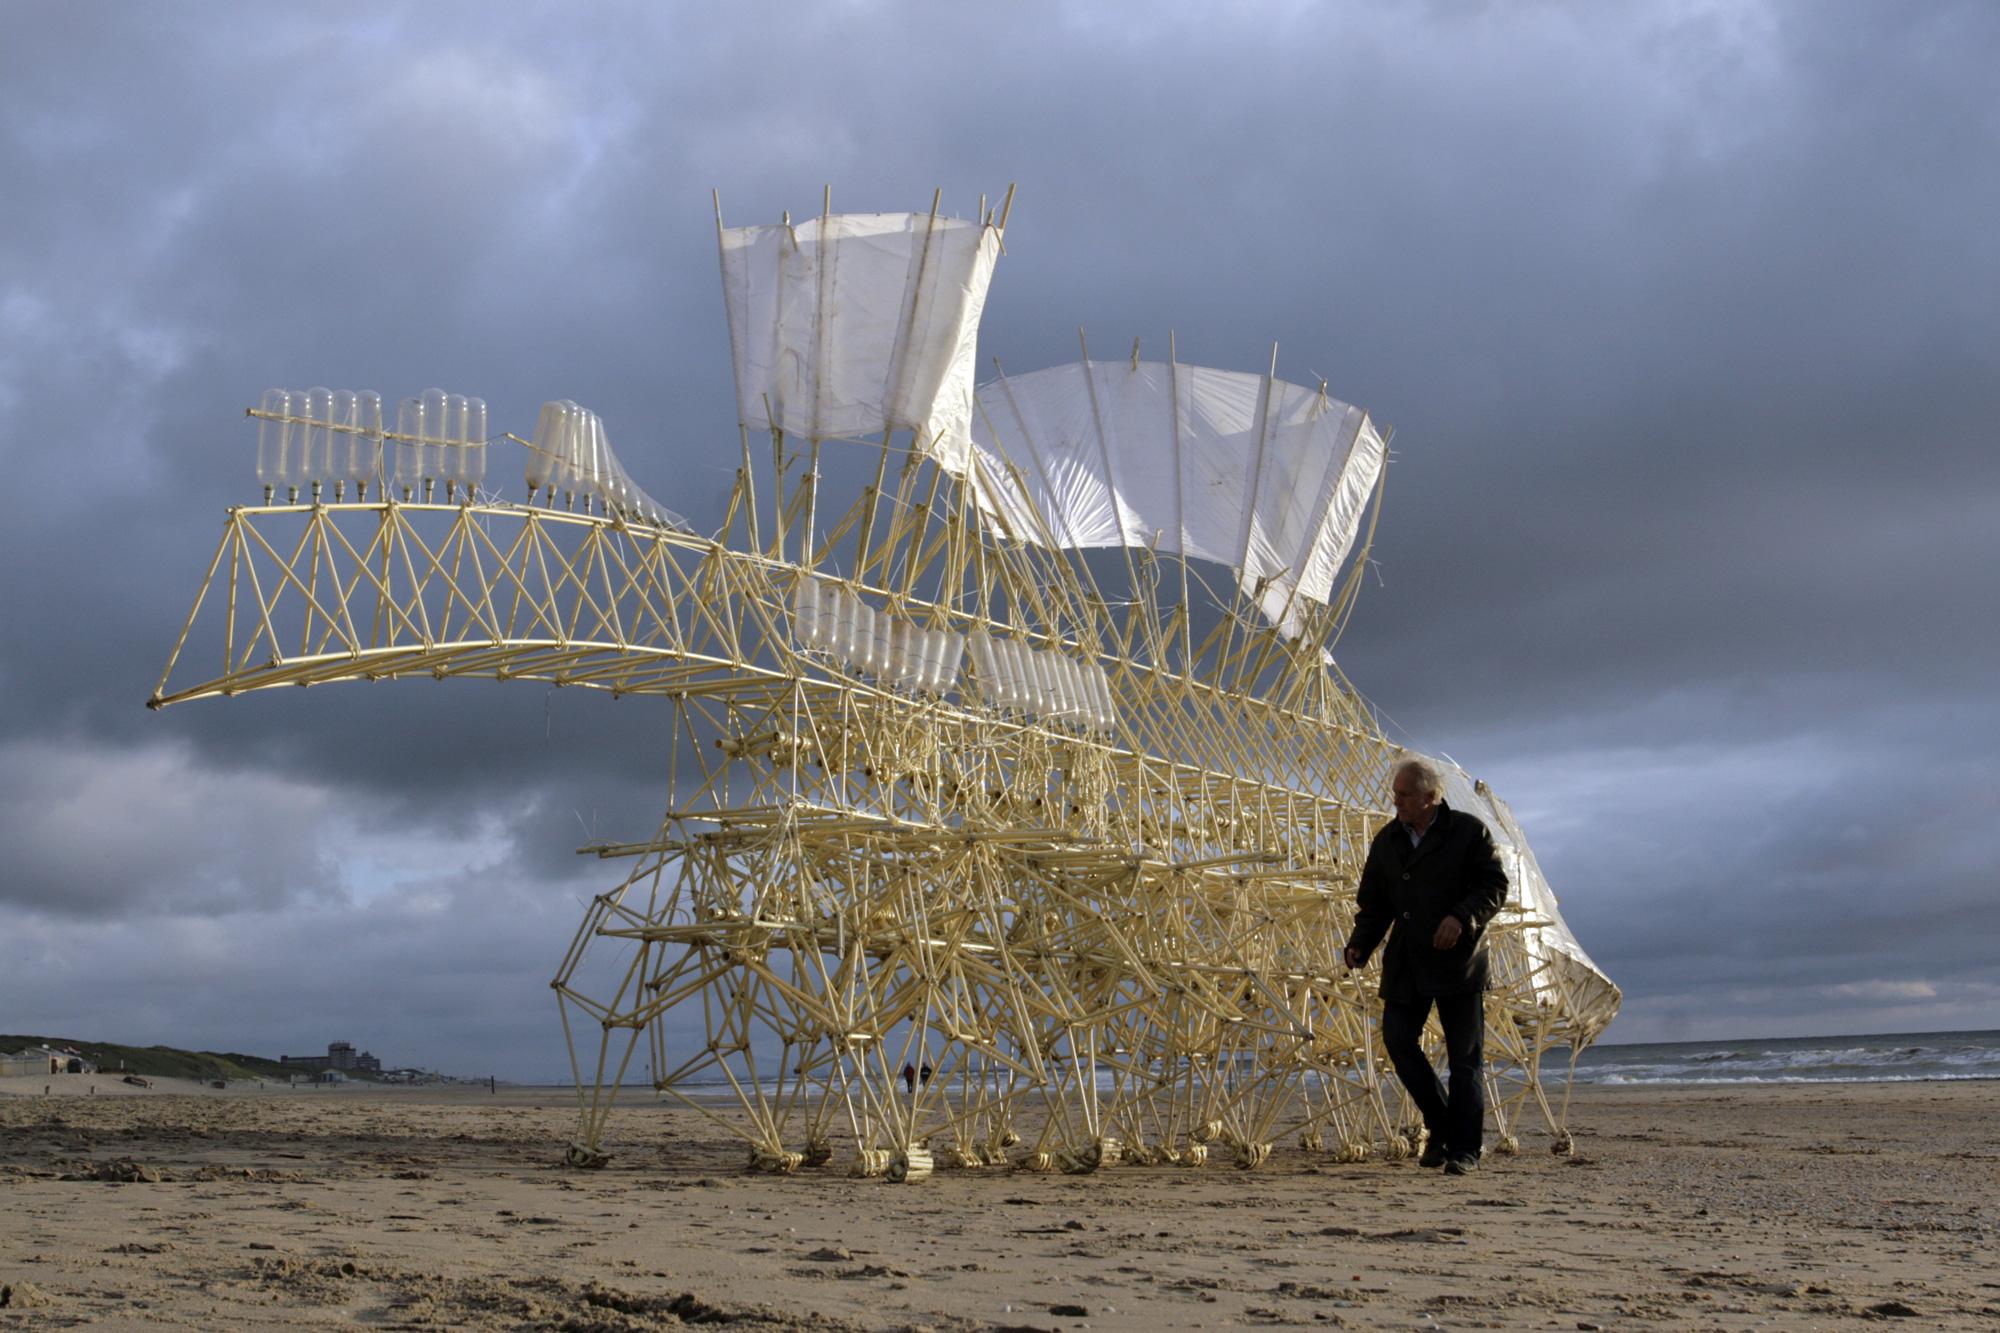 Theo Jansen, Strandbeest